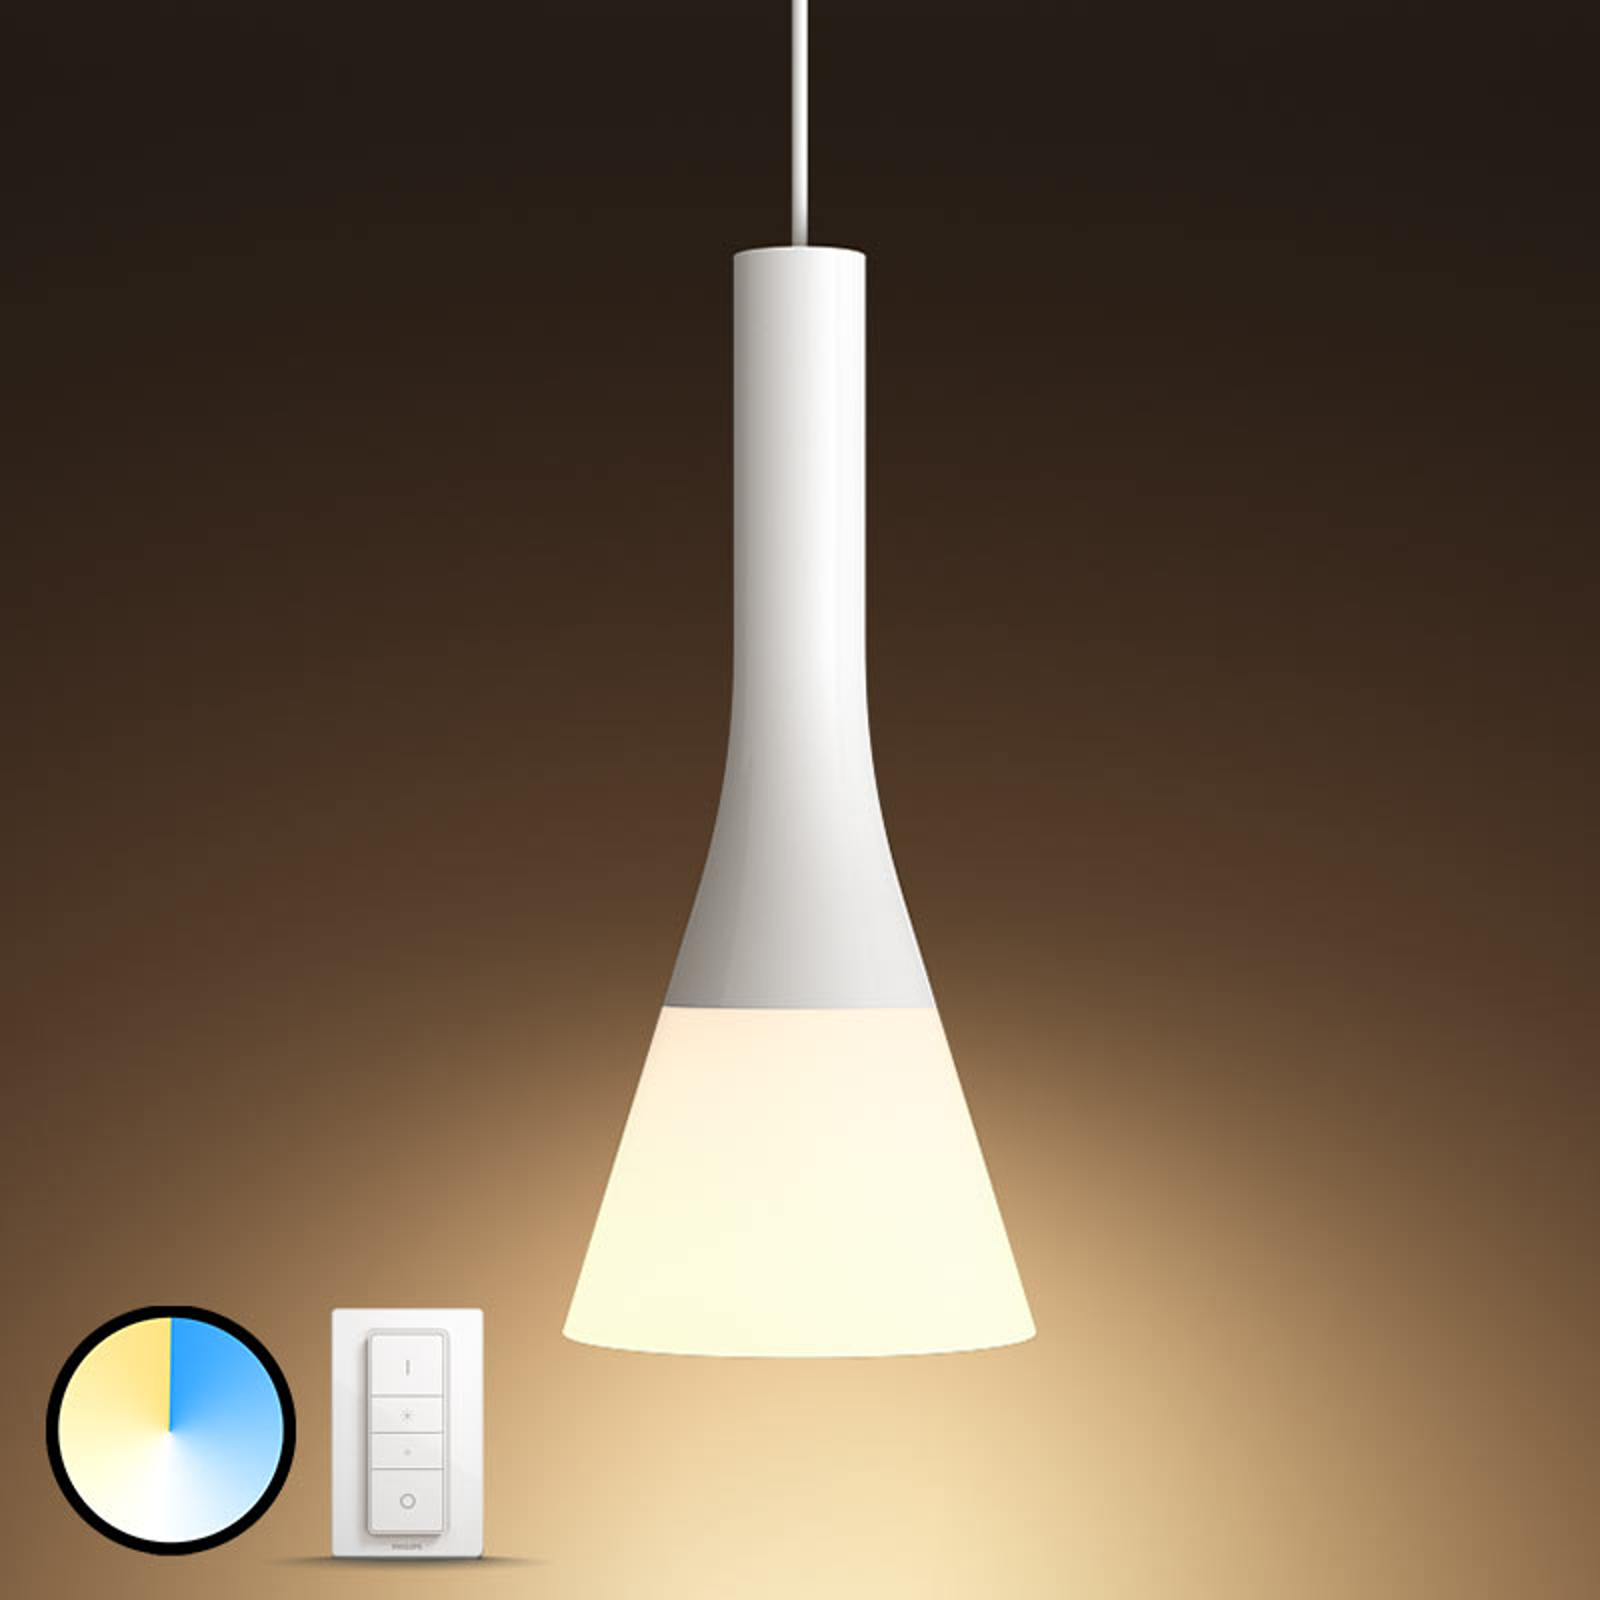 Philips Hue White Ambiance lampa wisząca